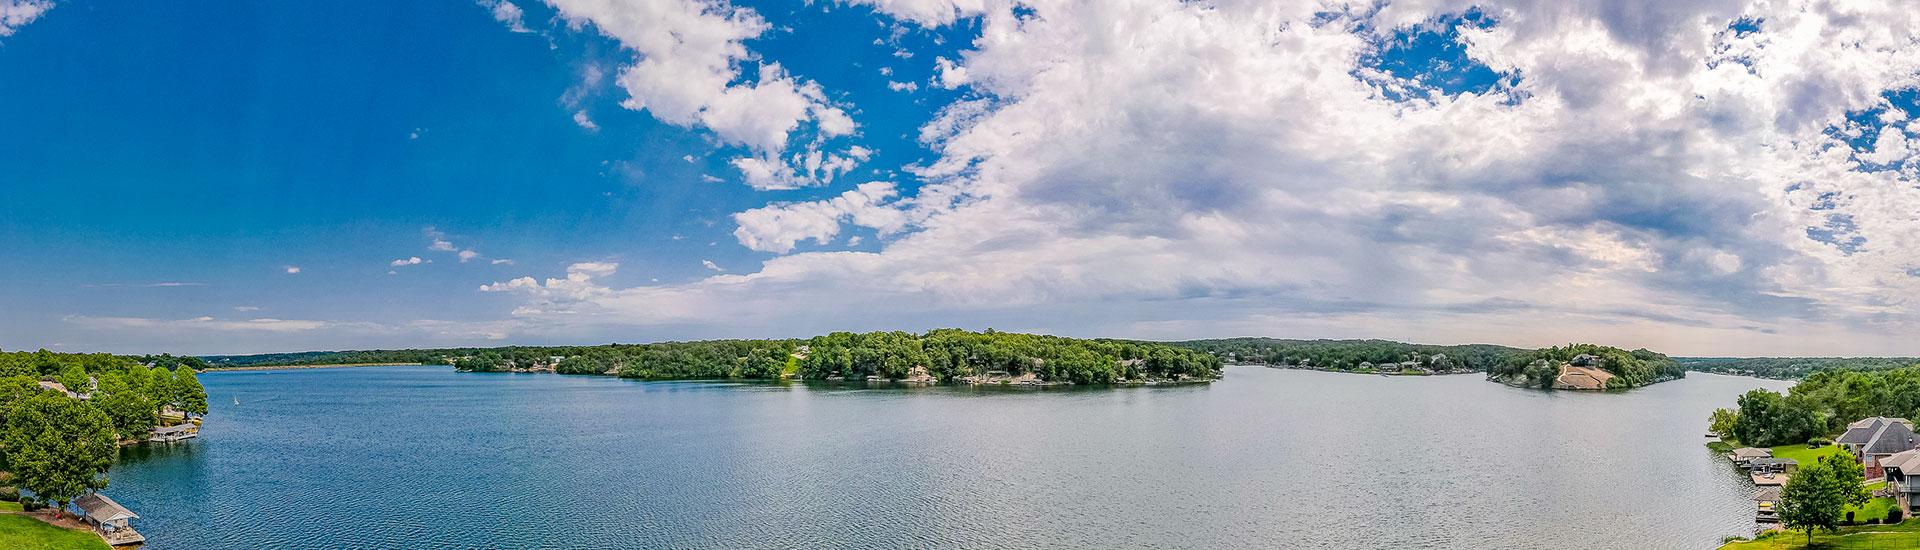 Loch Lomond in the Bella Vista Ozarks of Northwest Arkansas